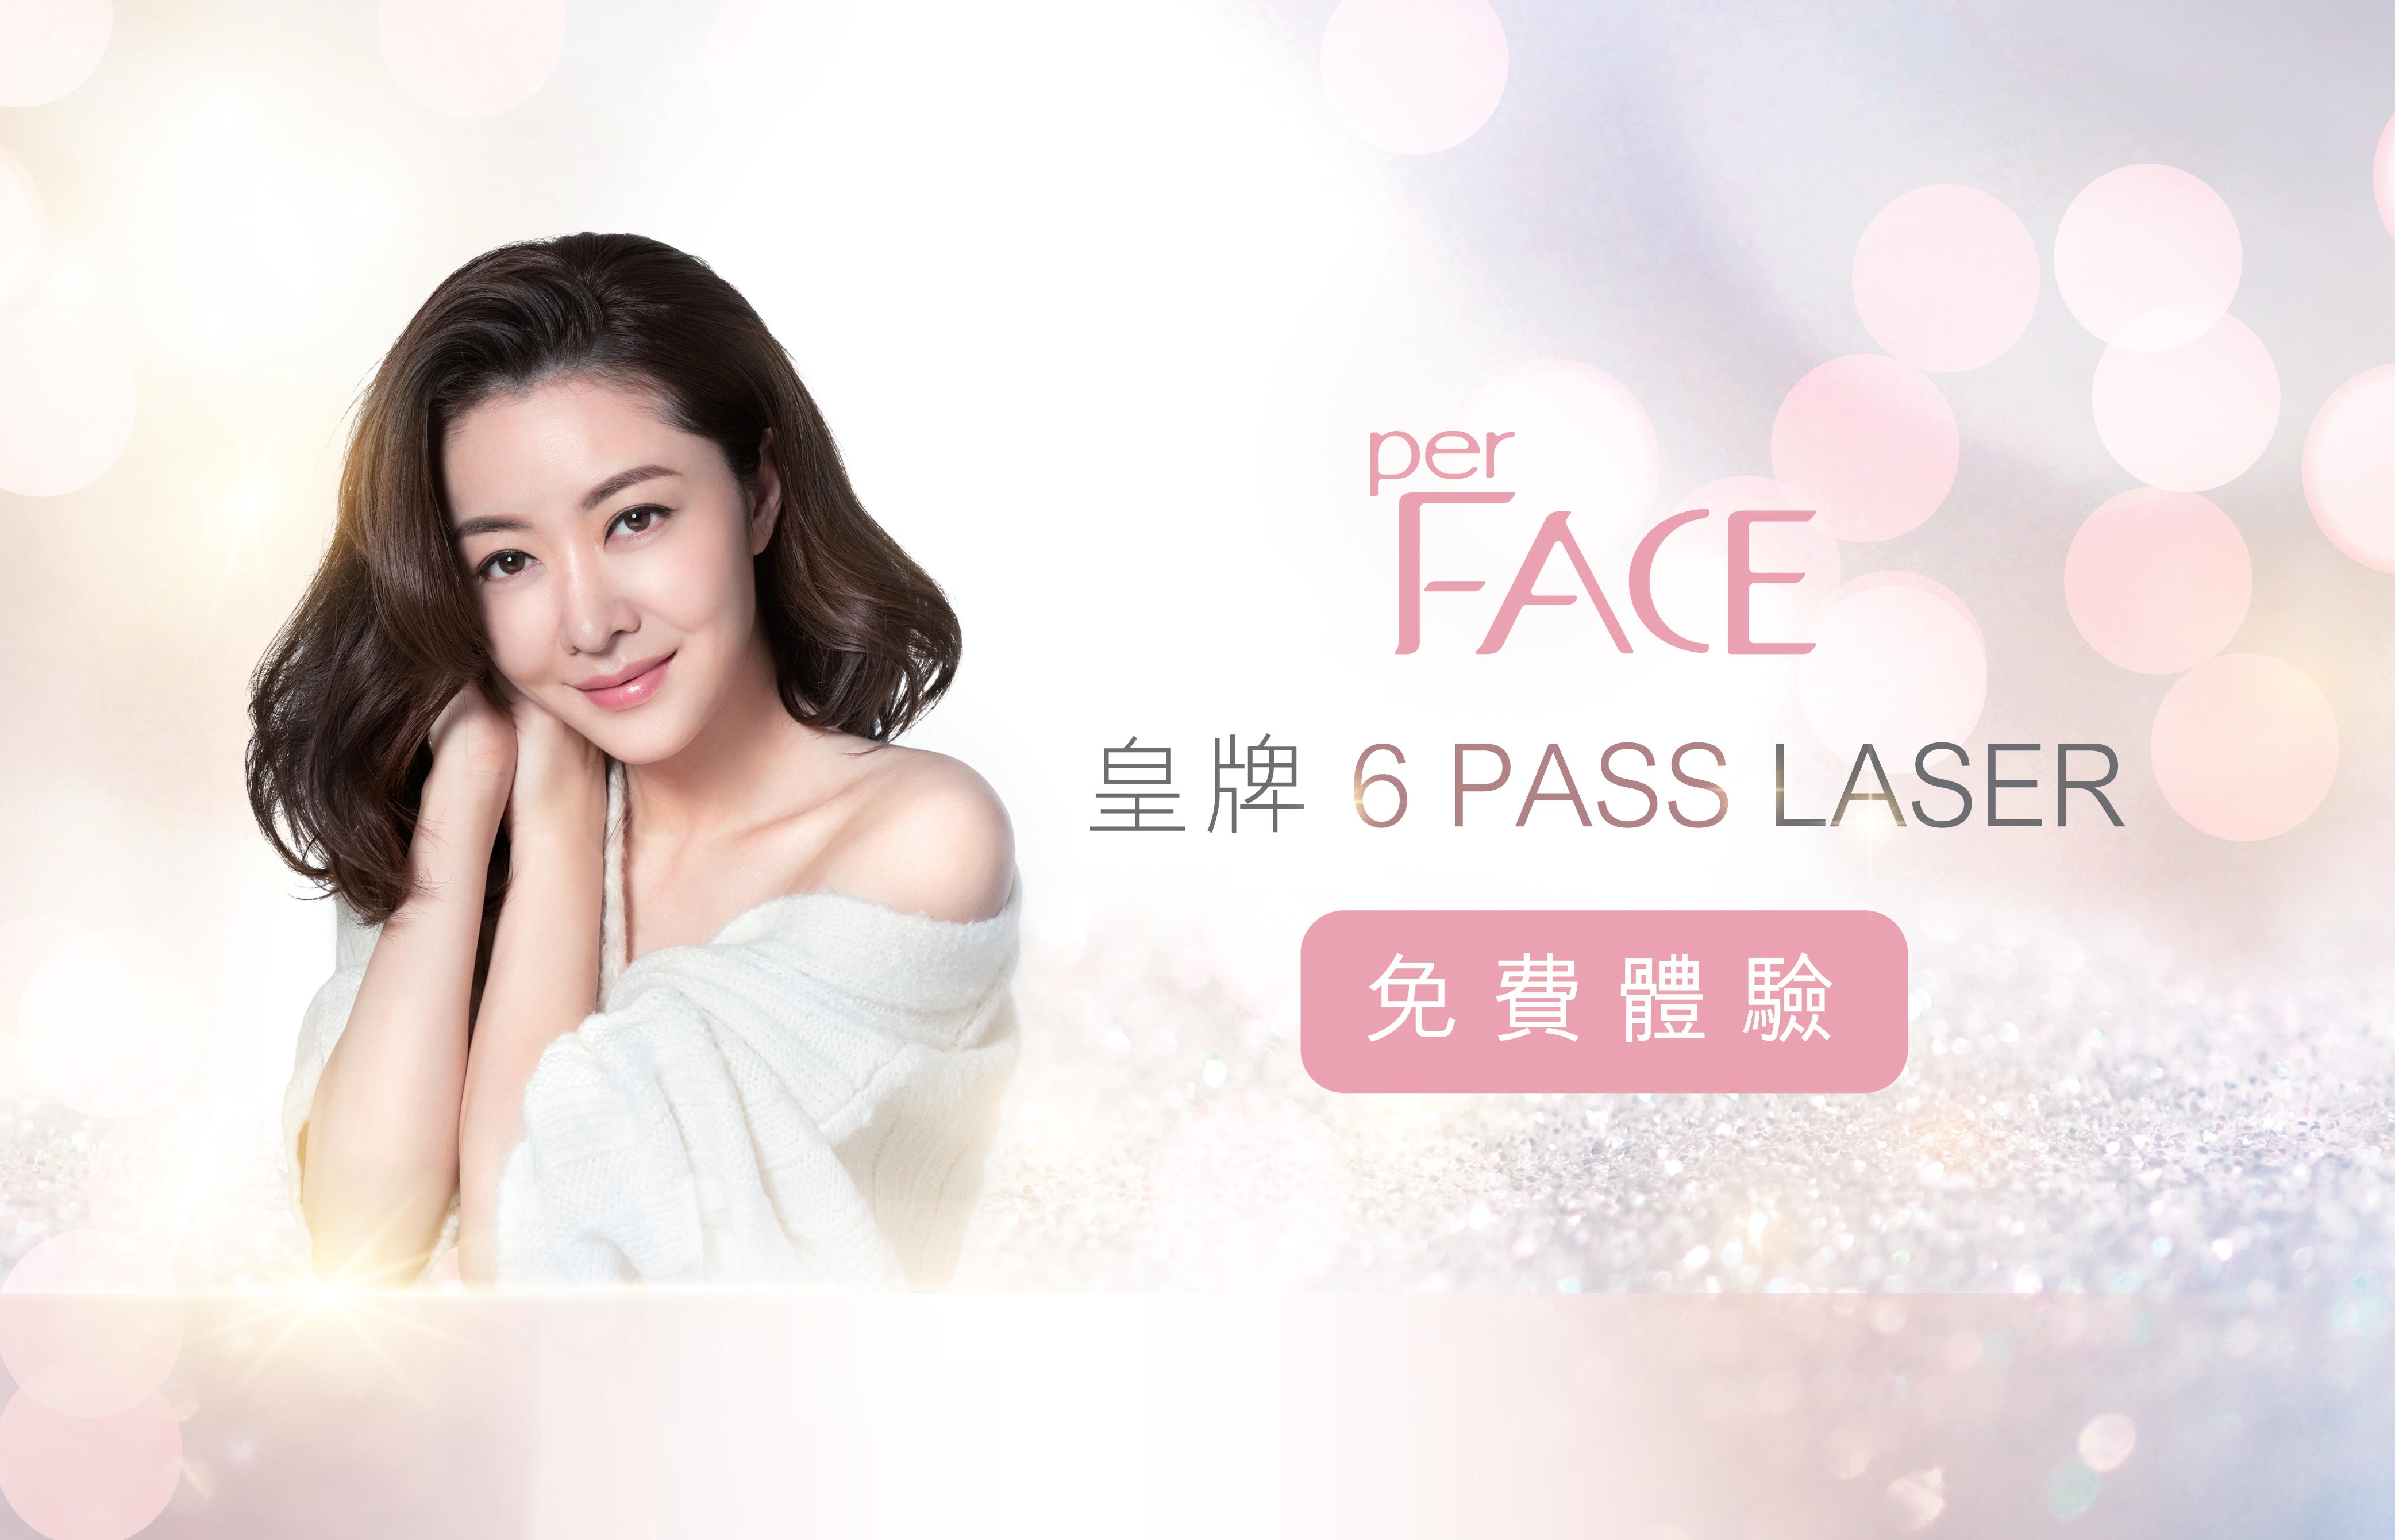 perFACE : 免費皇牌 6 Pass Laser @ Fashion Walk